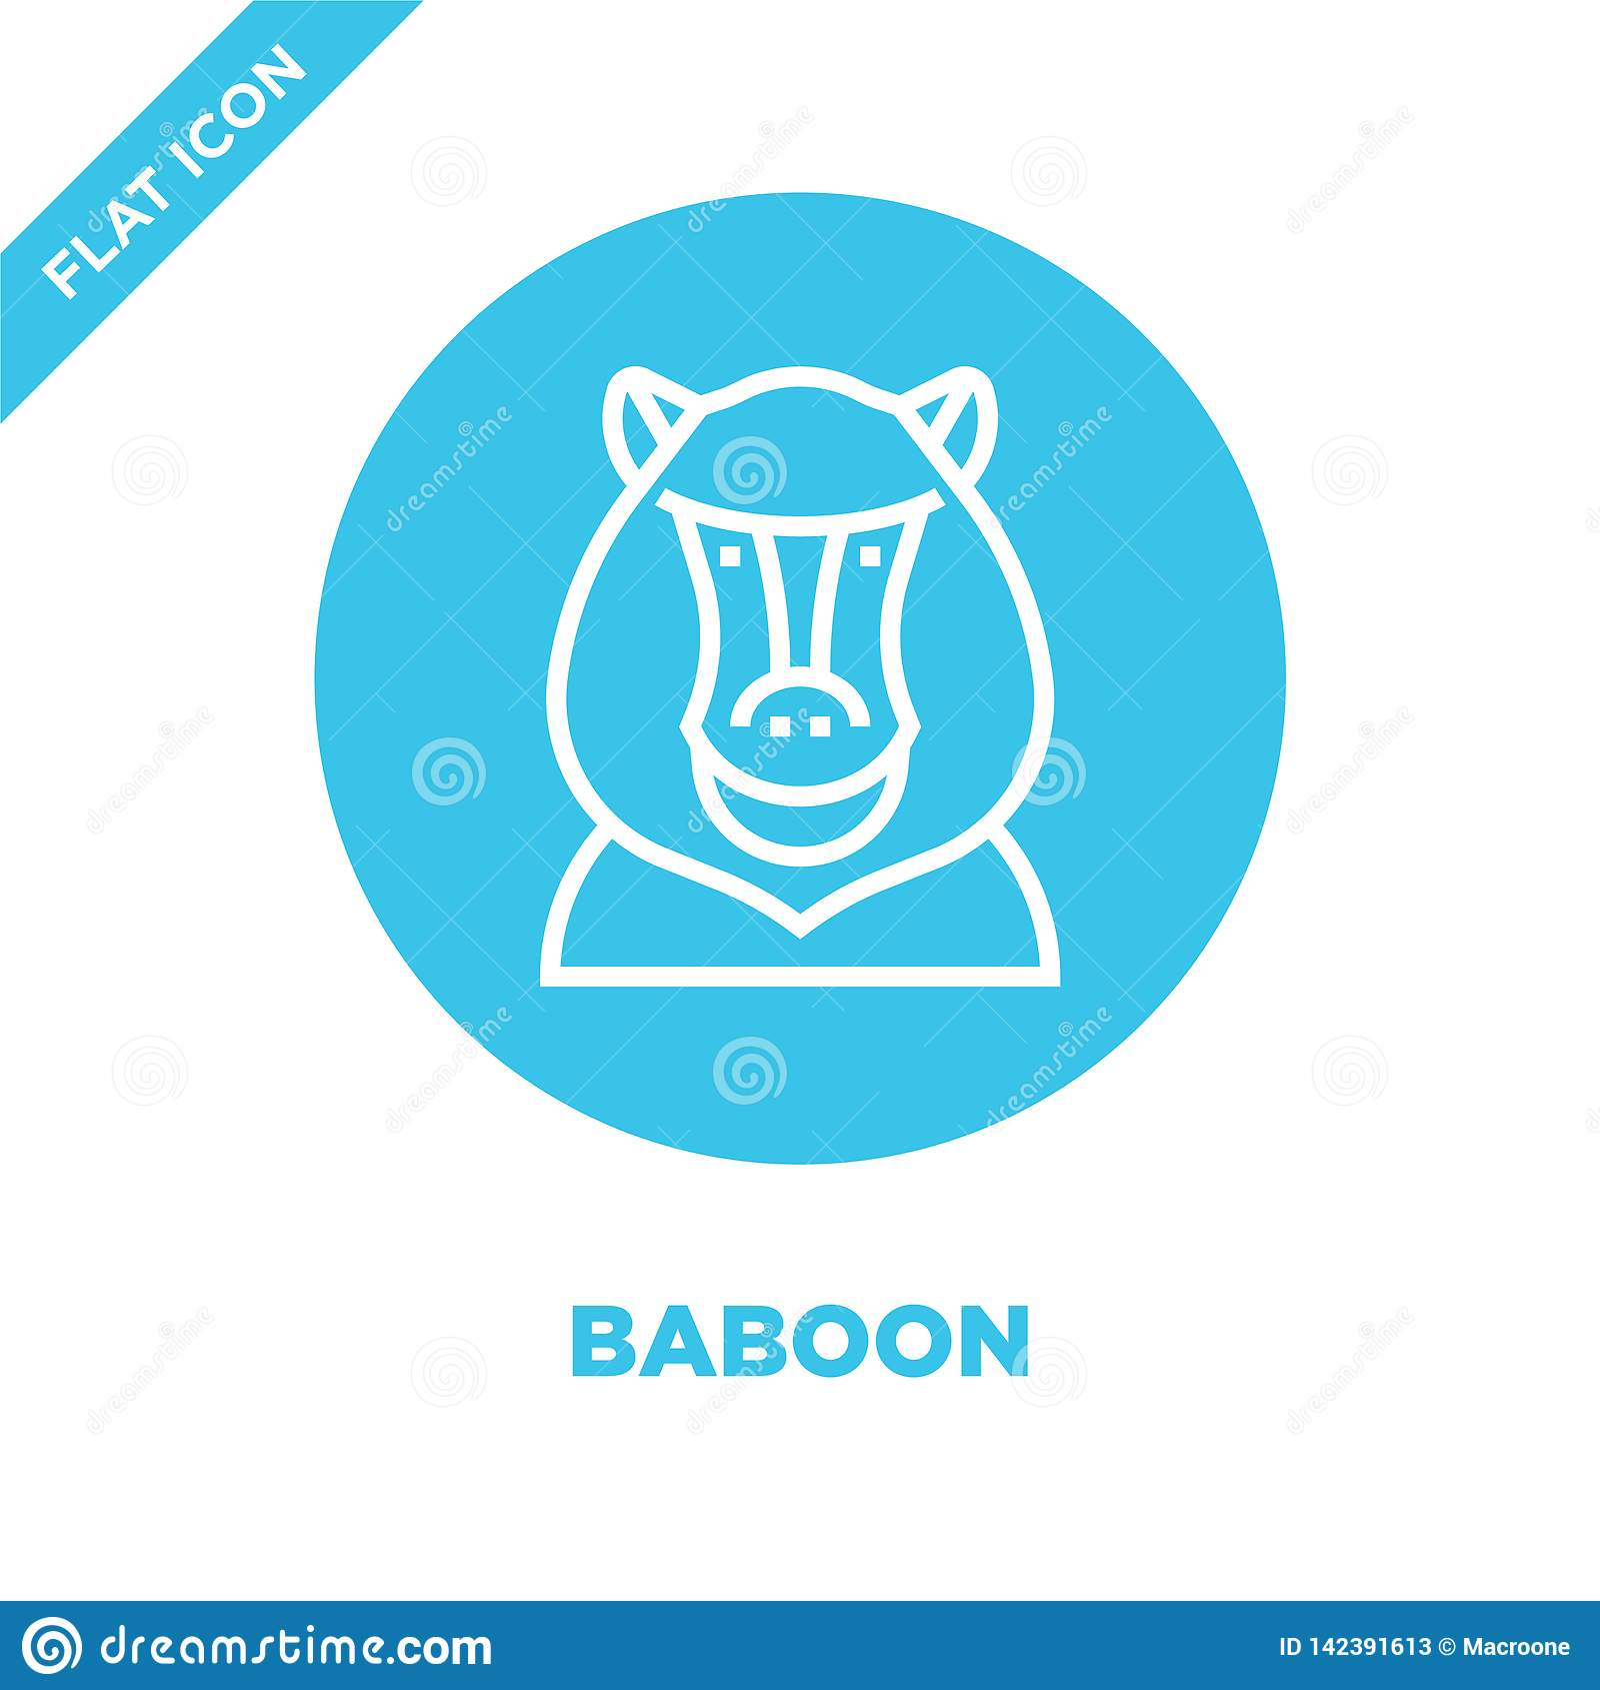 Baboon διάνυσμα εικονιδίων από τη ζωική επικεφαλής συλλογή Λεπτή baboon γραμμών διανυσματική απεικόνιση εικονιδίων περιλήψεων Γρα